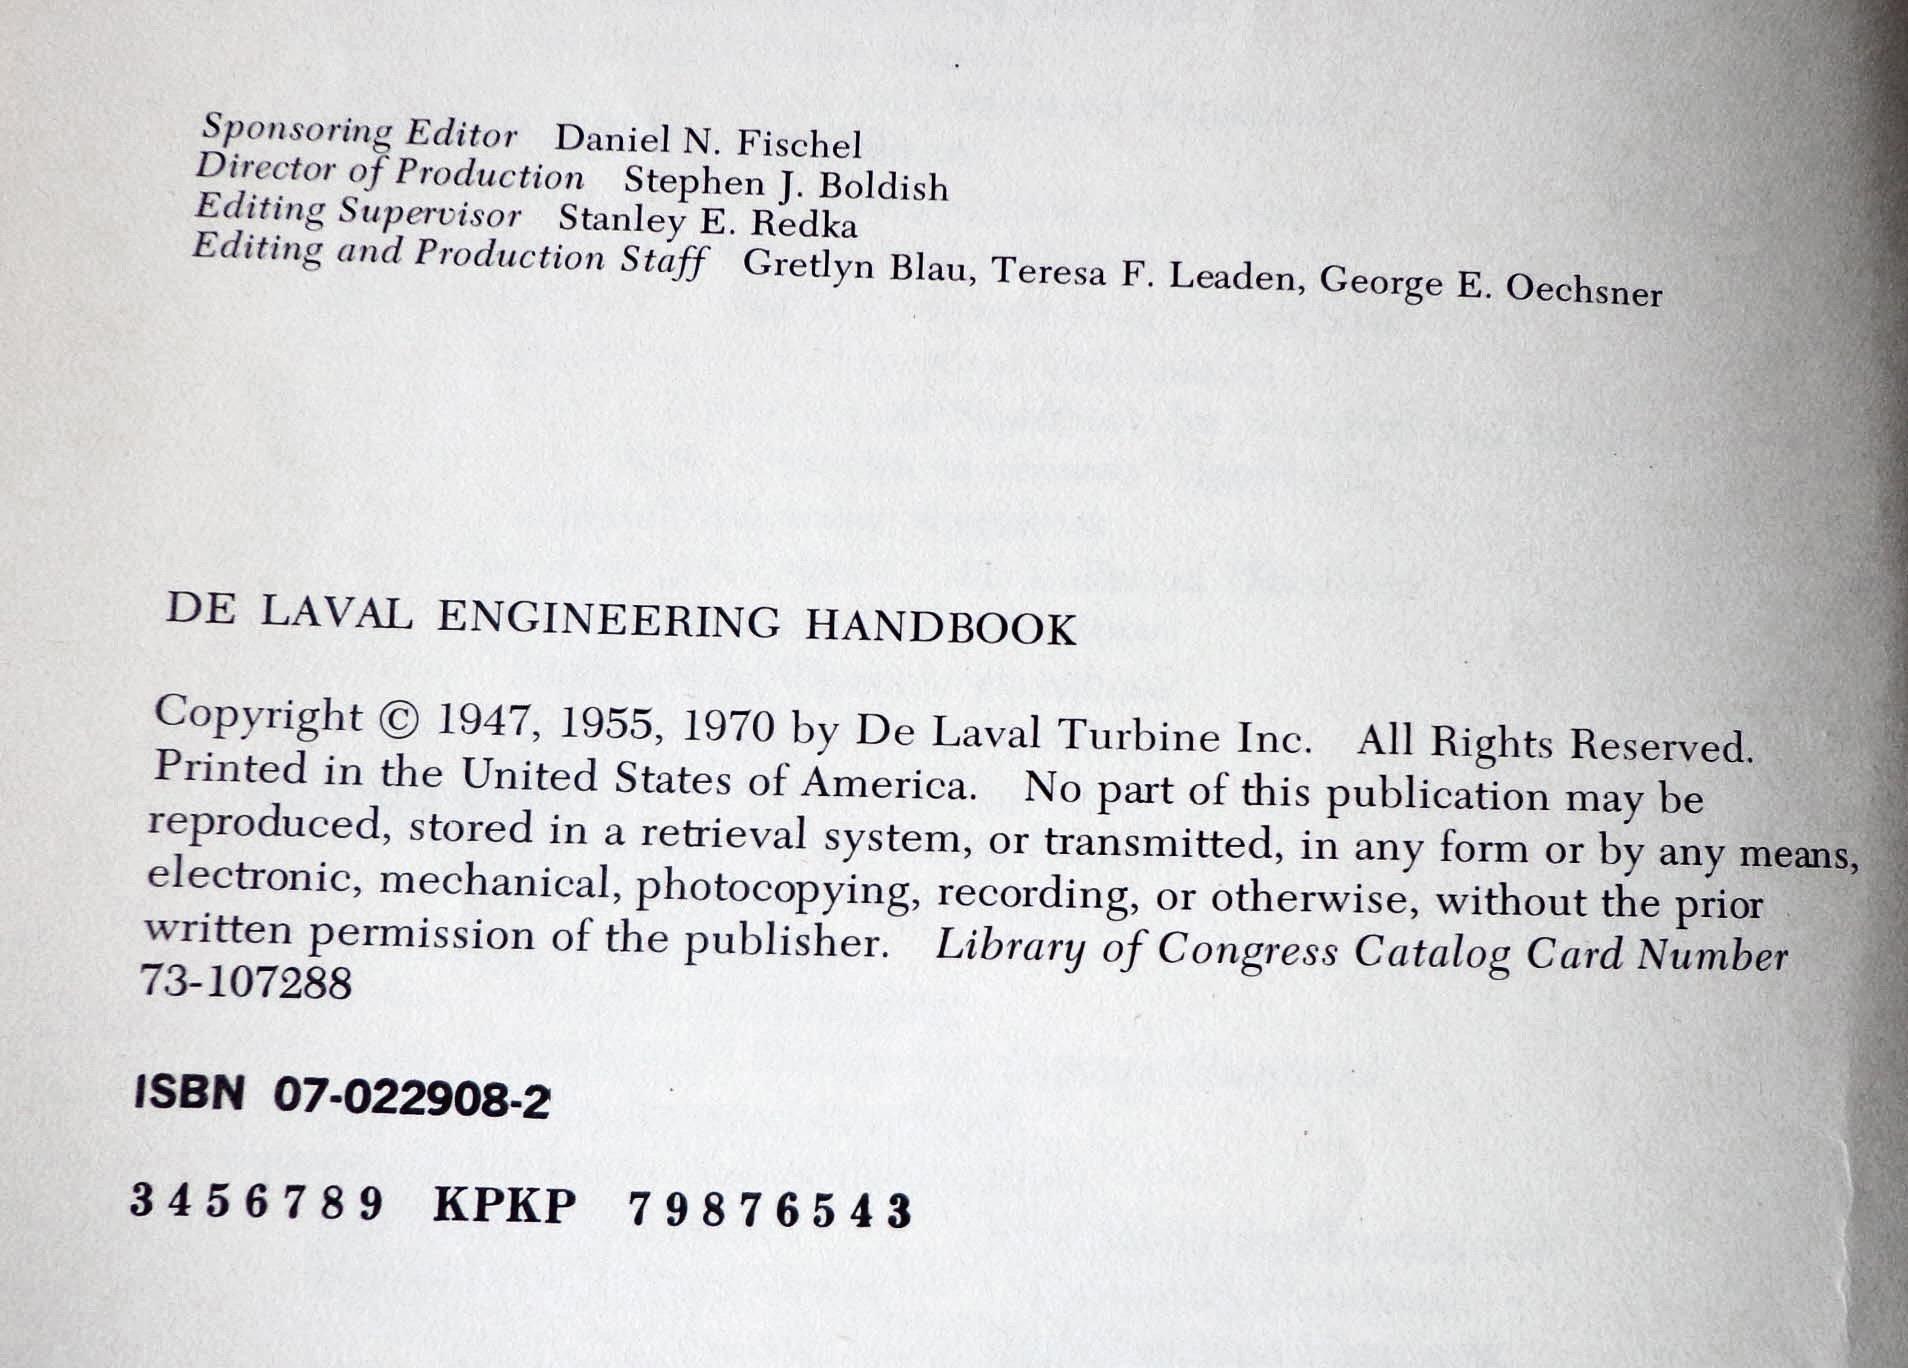 De Laval Engineering Handbook De Laval Turbine Inc